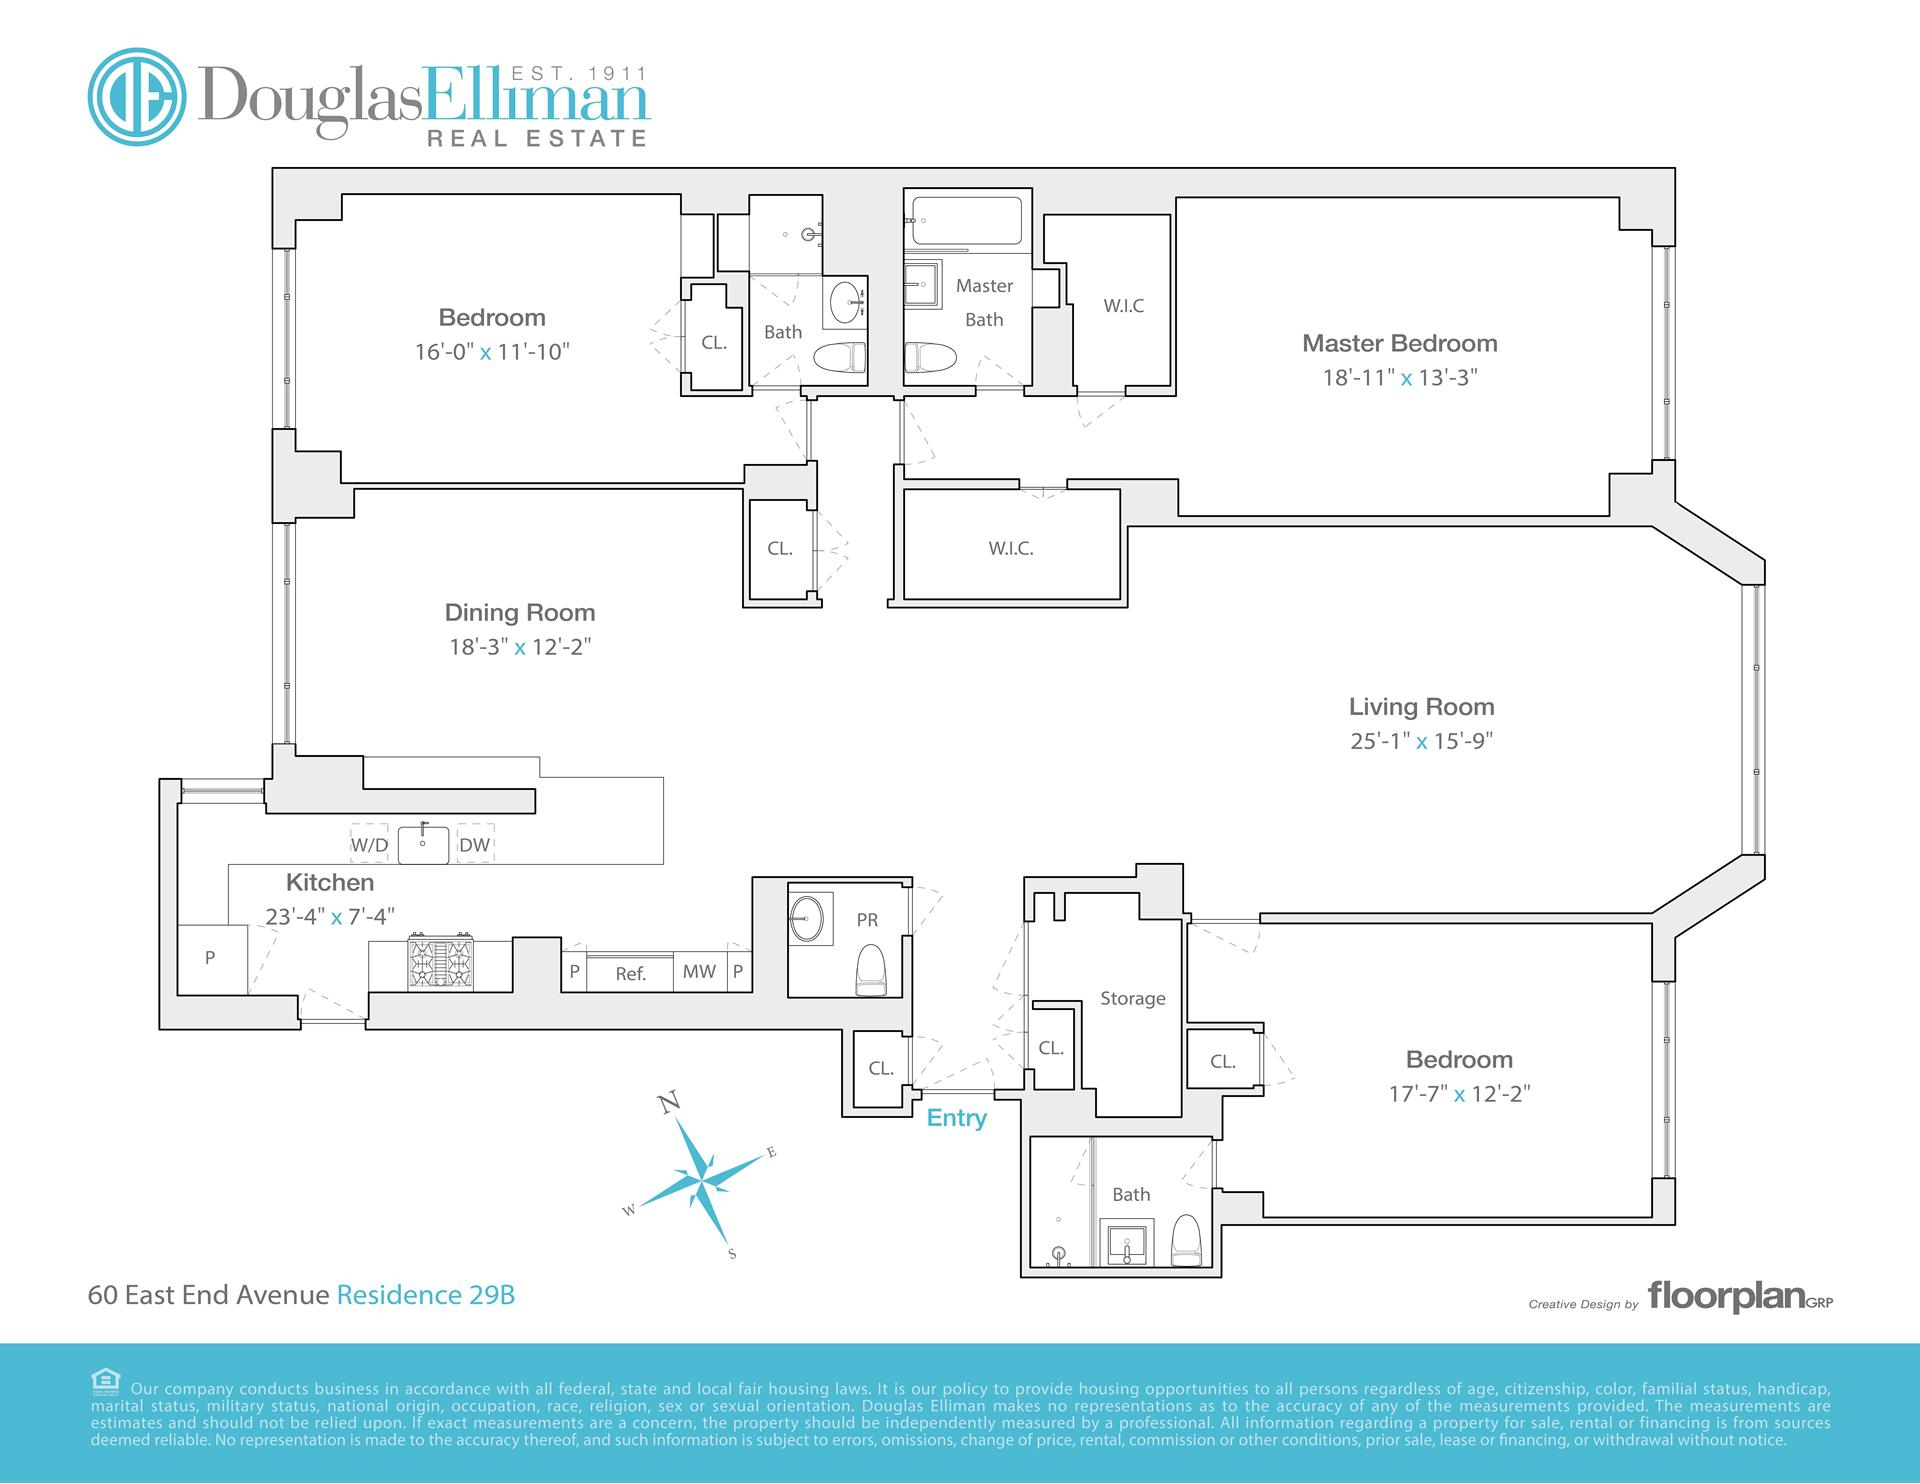 Floor plan of 60 East End Avenue, 29B - Upper East Side, New York